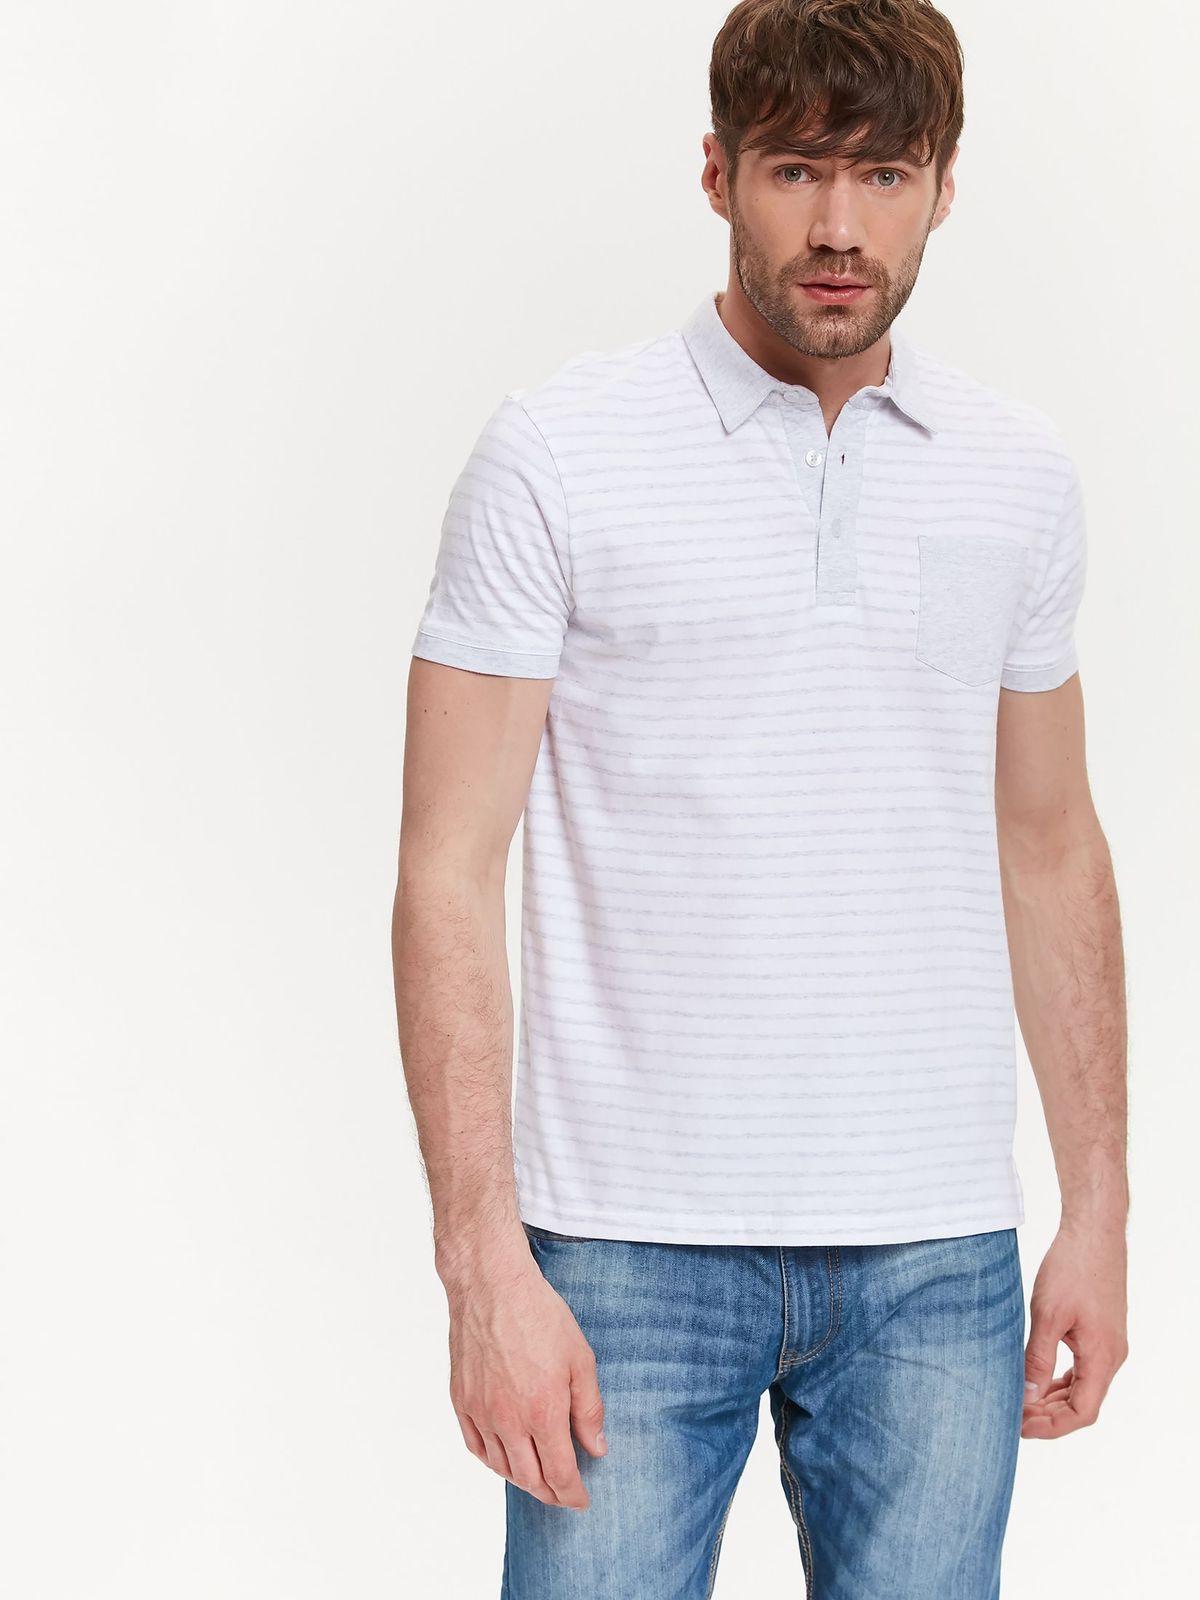 TOP SECRET top secret ανδρικο polo t-shirt